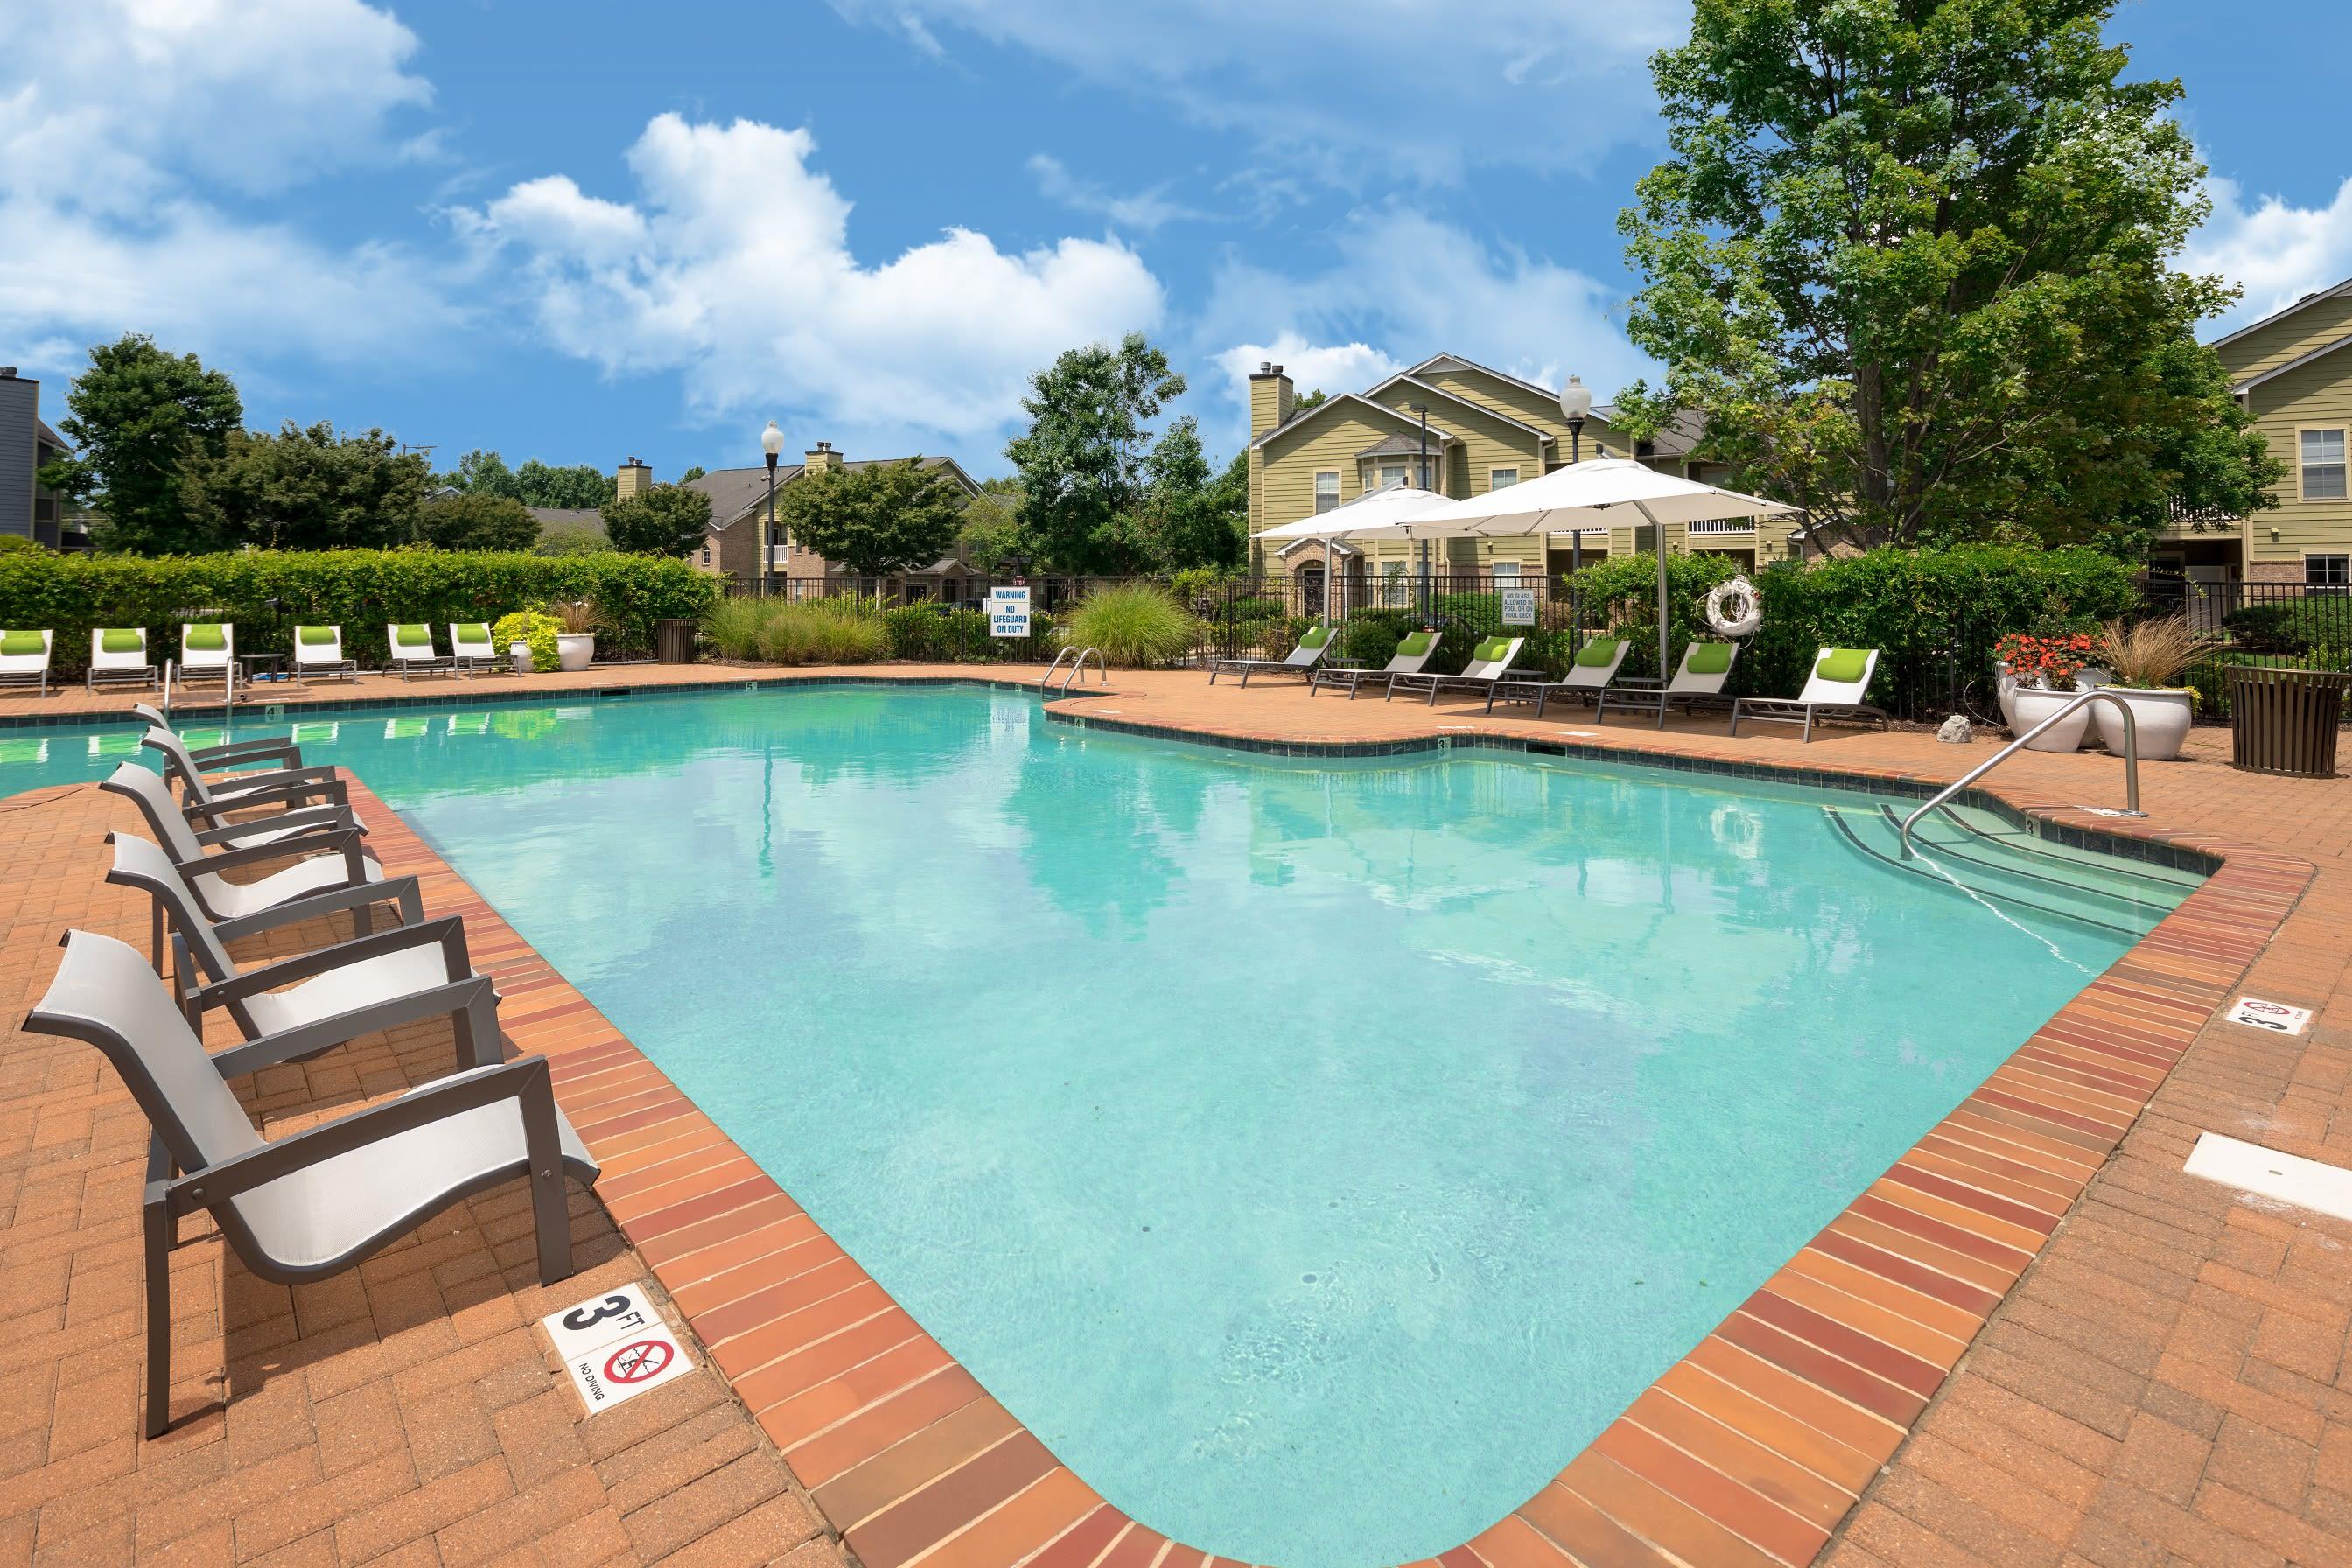 Outdoor pool at Highlands at Alexander Pointe in Charlotte, North Carolina